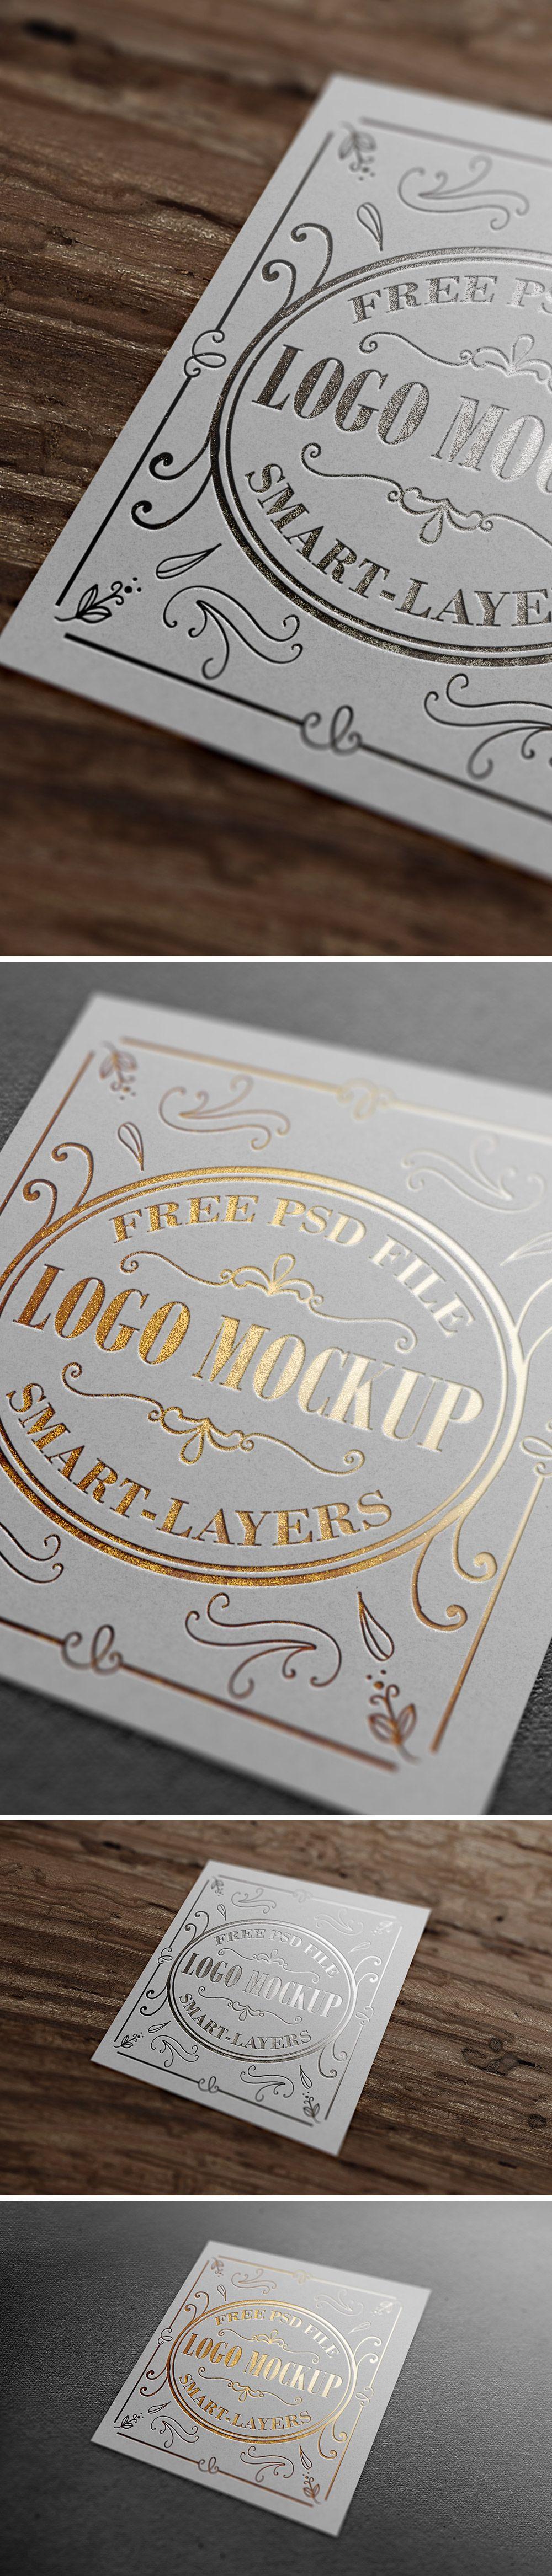 free gold silver foil logo mockup 202 mb